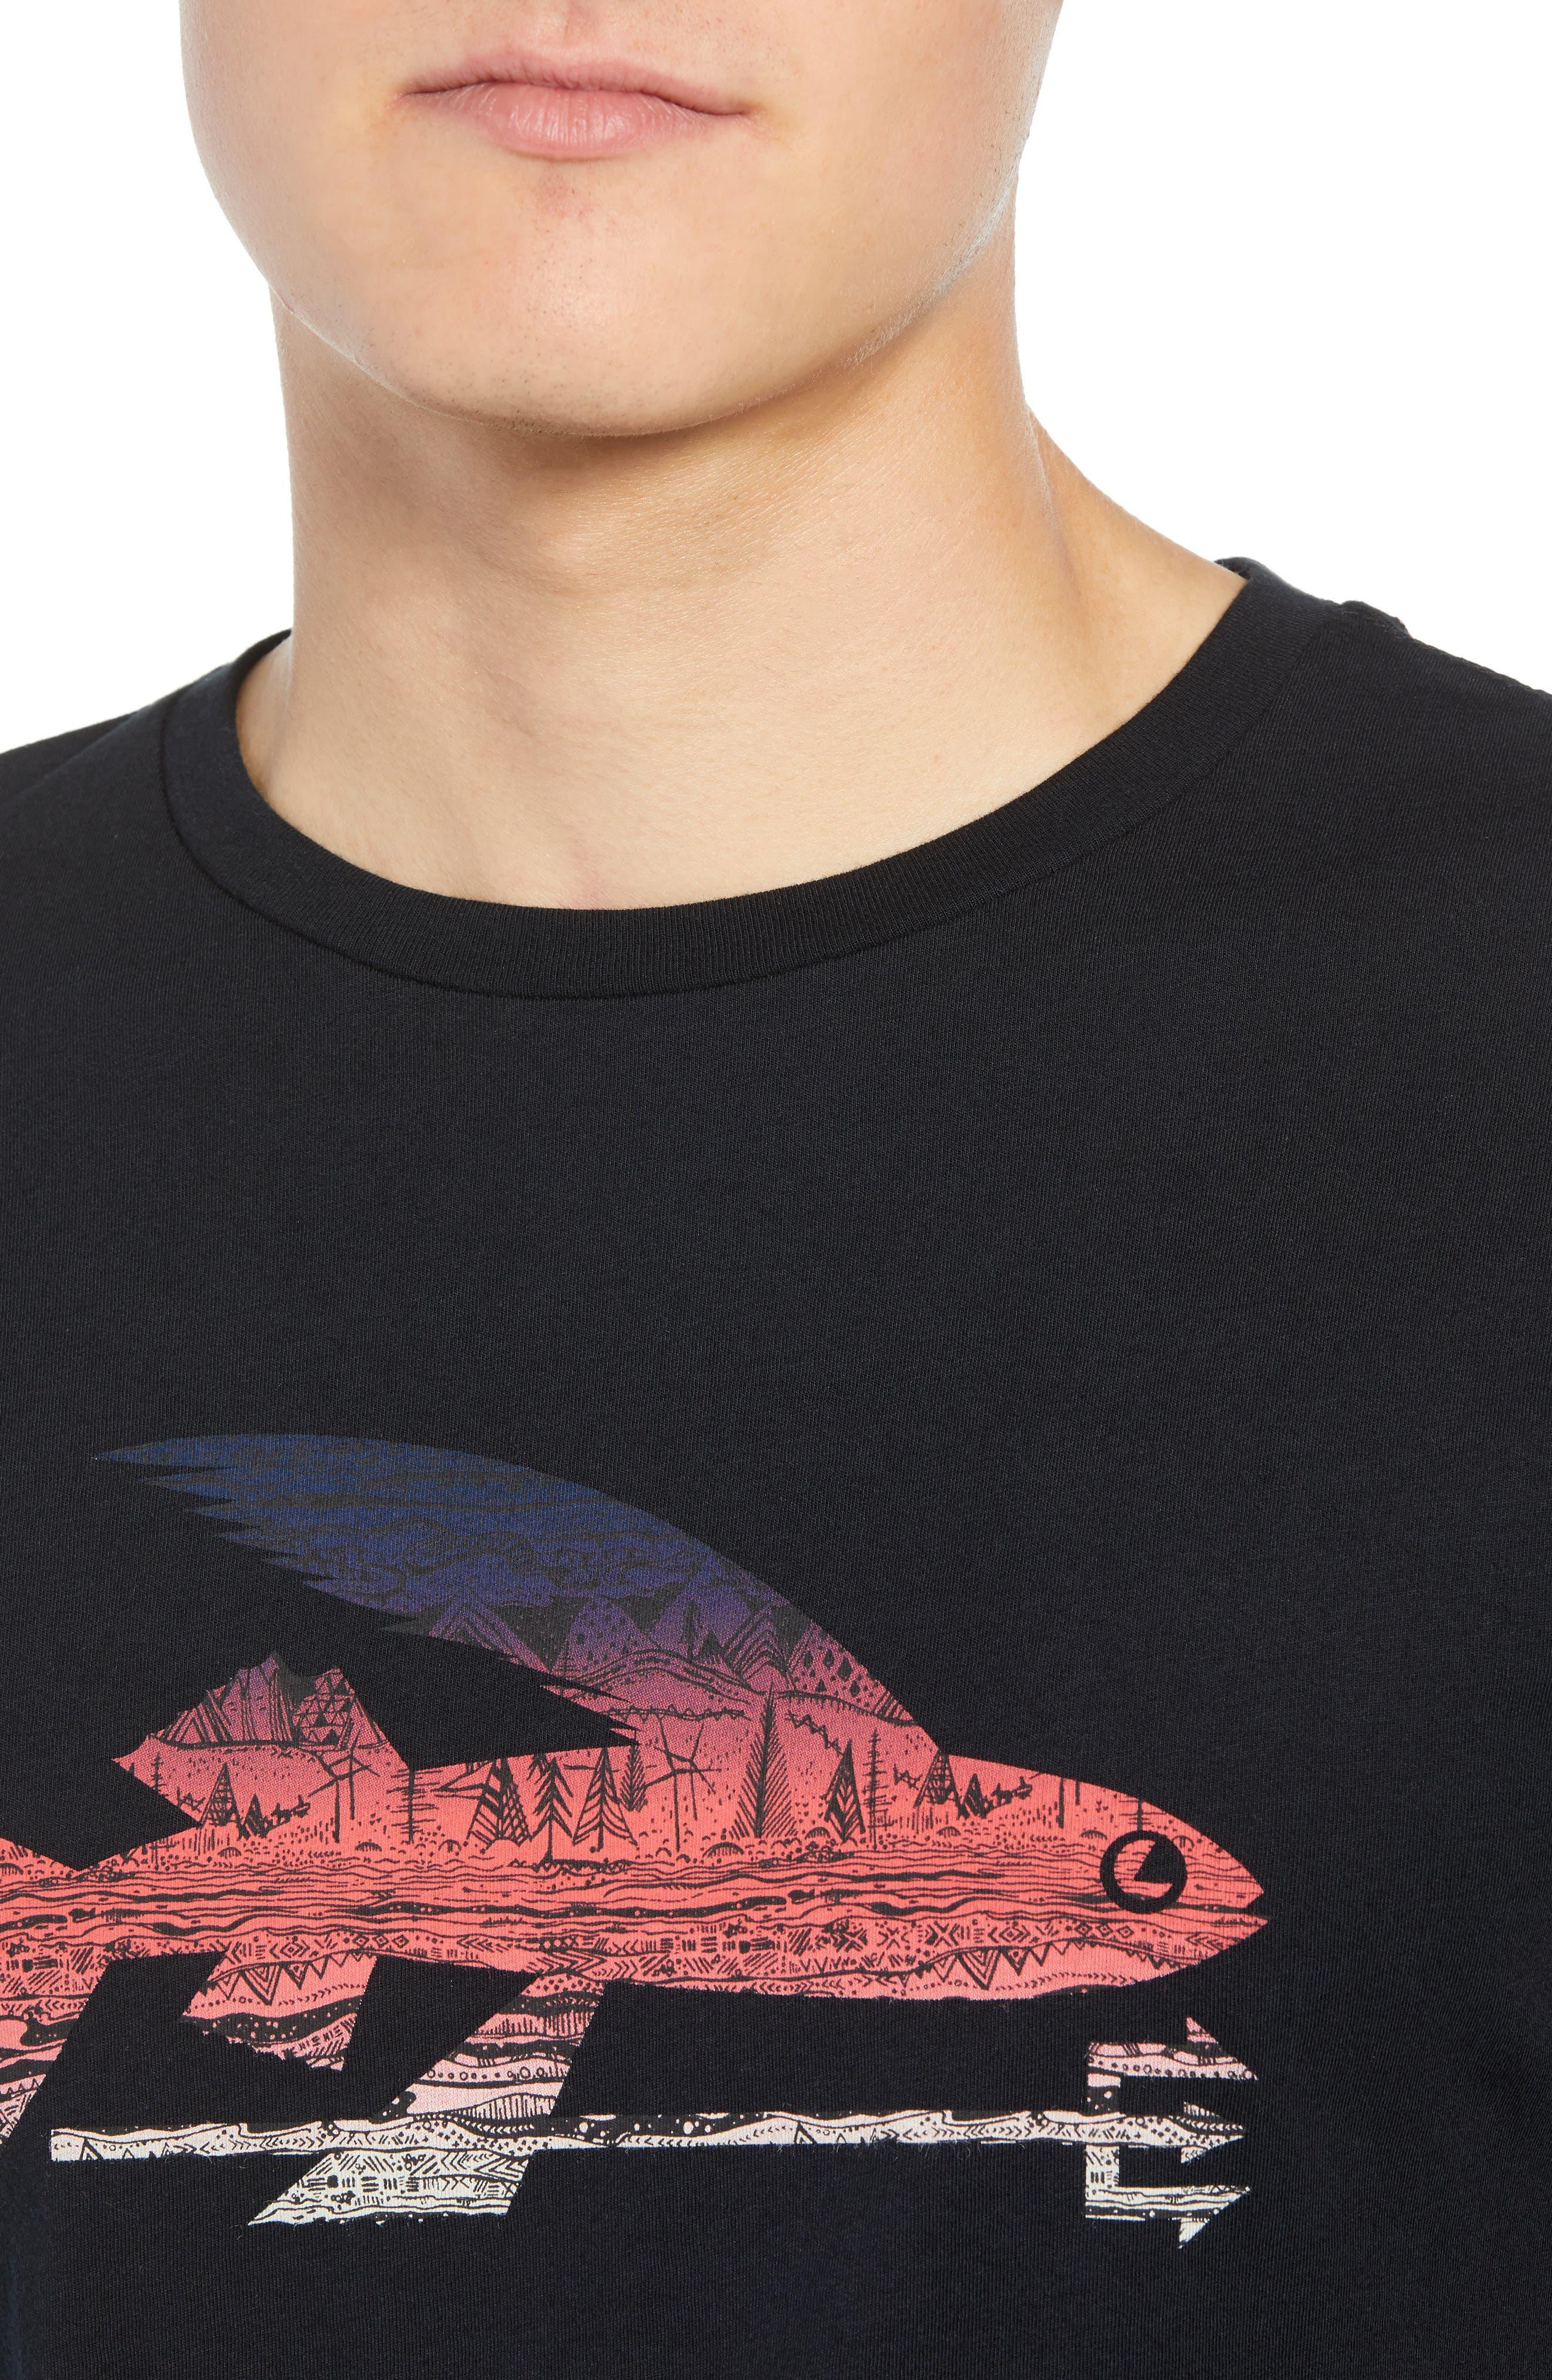 Flying Fish Organic Cotton T-Shirt,                             Alternate thumbnail 4, color,                             BLACK/ ALBANIAN LANDSCAPE